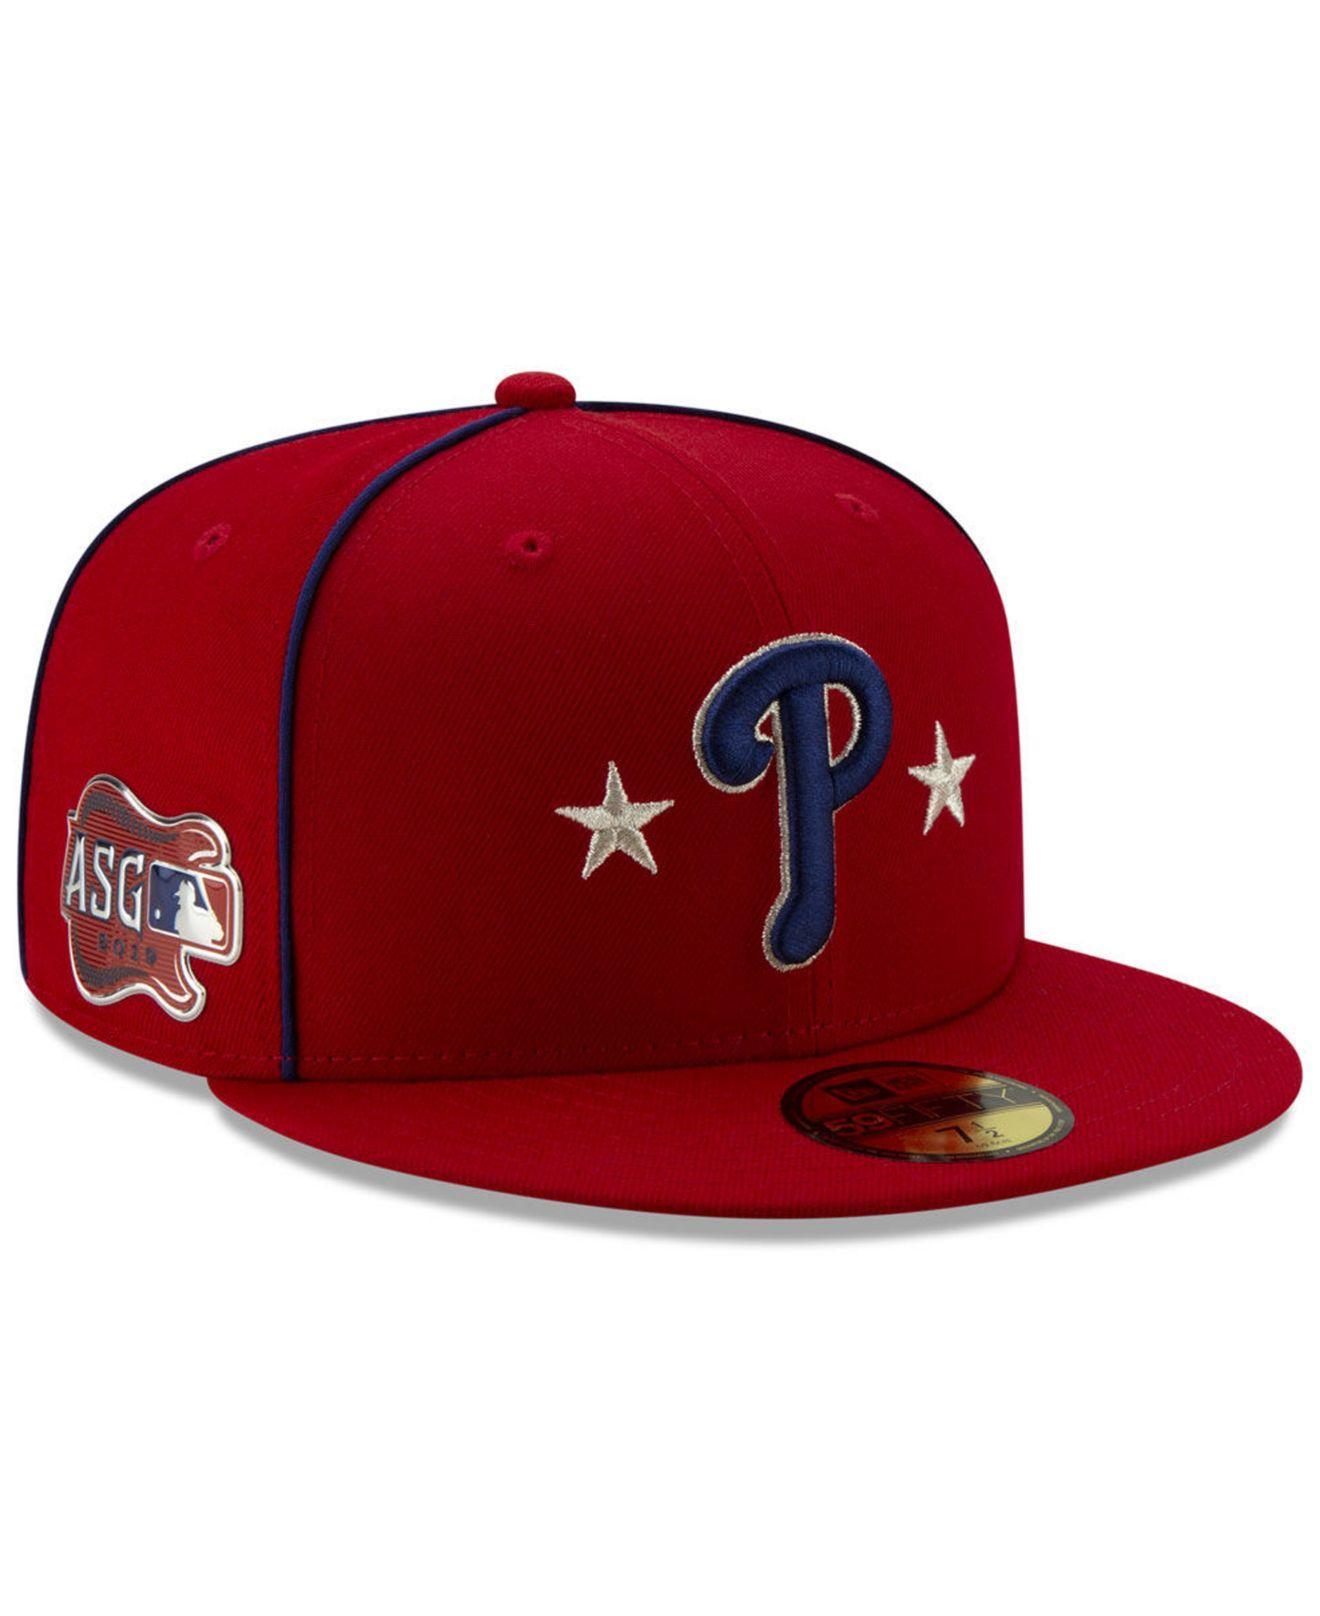 bdbbf43a ... Philadelphia Phillies All Star Game Patch 59fifty Cap for Men - Lyst.  View fullscreen